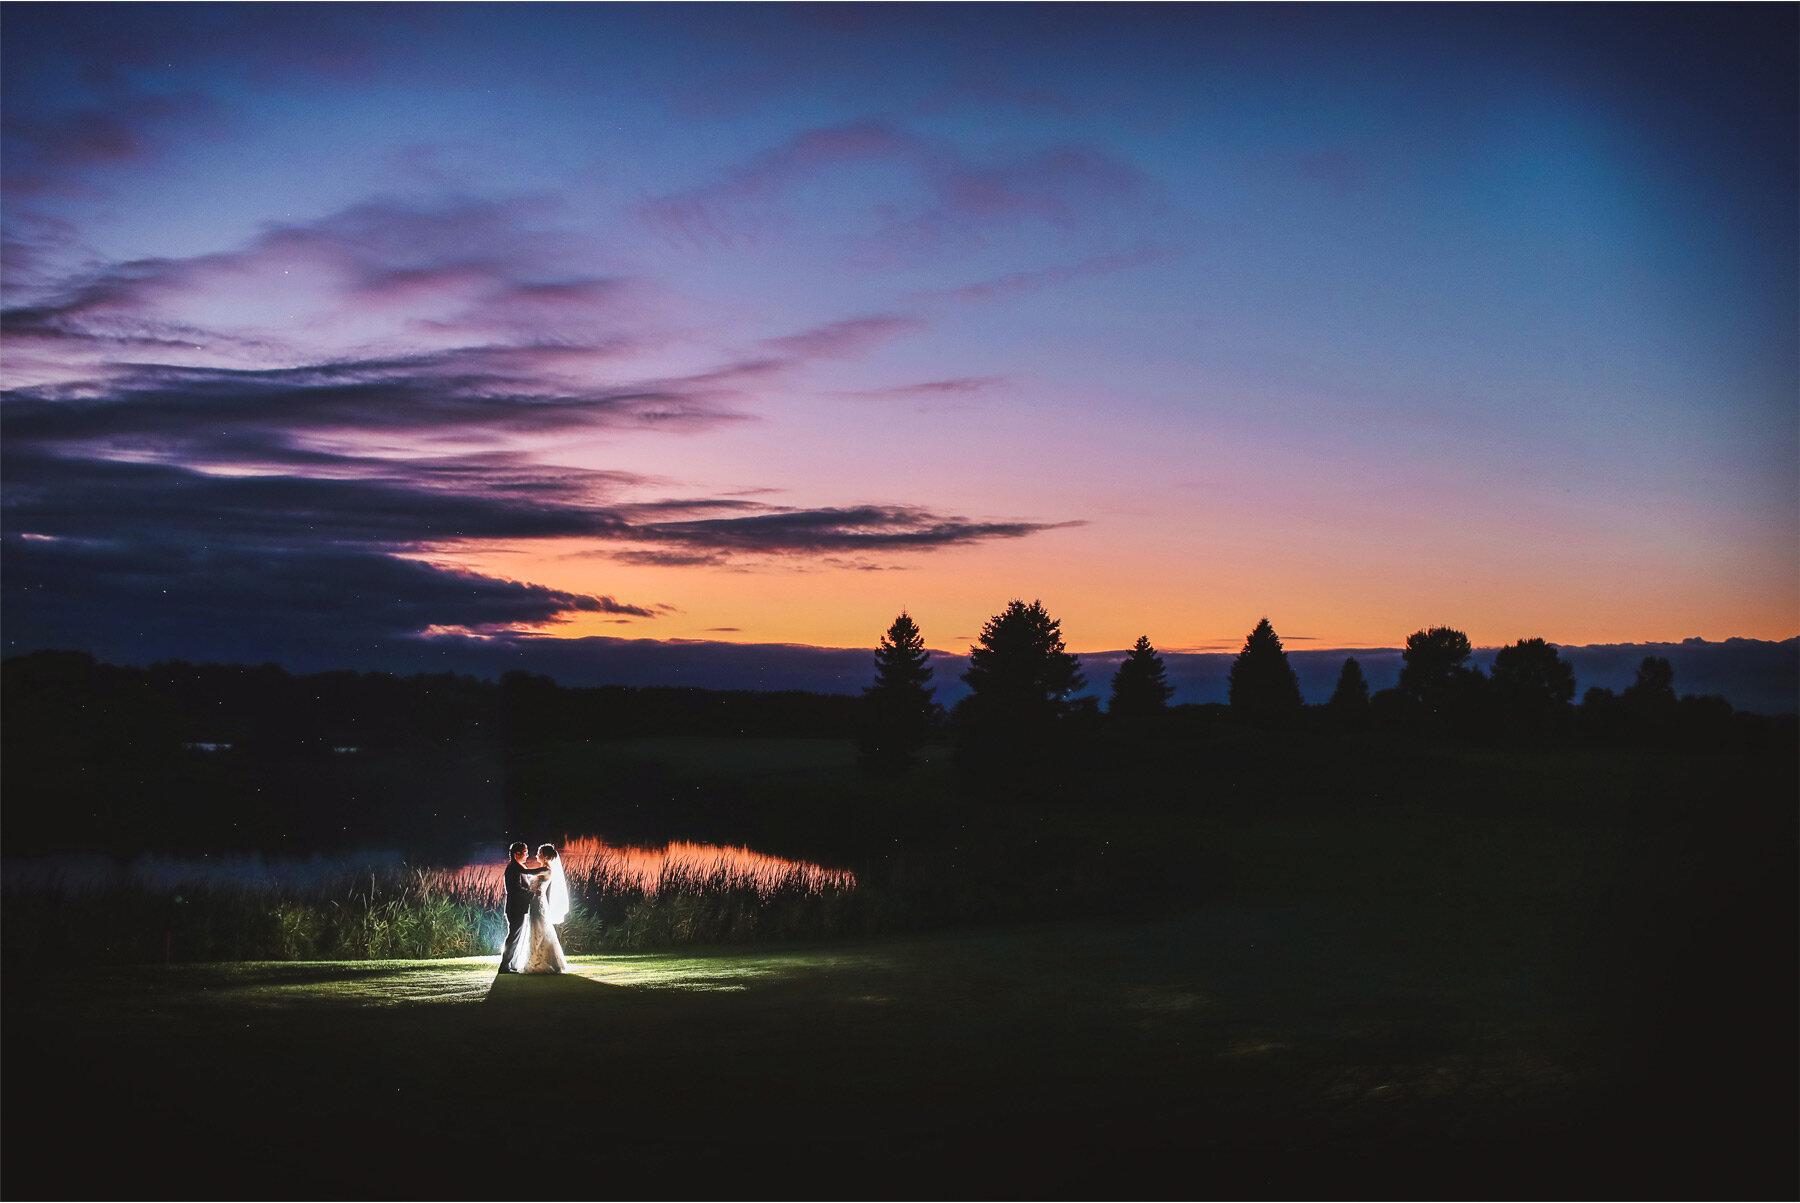 22-Vick-Photography-Minneapolis-Minnesota-Wedding-Rush-Creek-Golf-Club-Reception-Sunset-Amanda-and-Michael.jpg